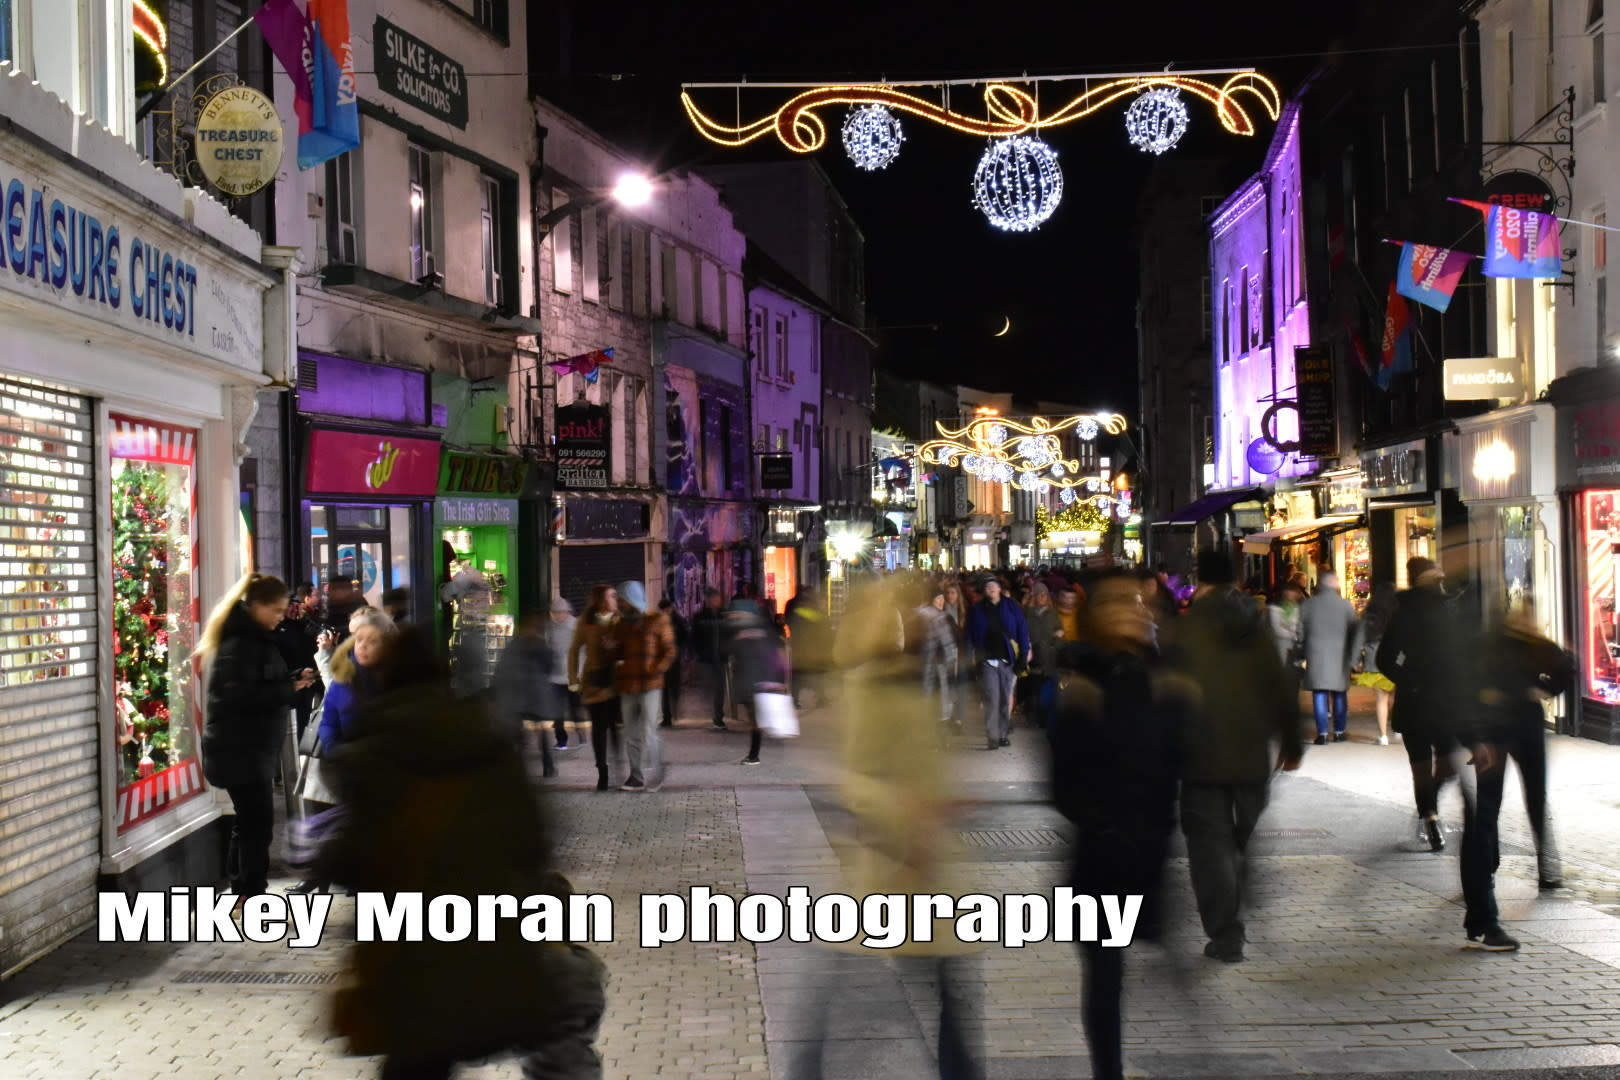 mikey moran photography shop street at night